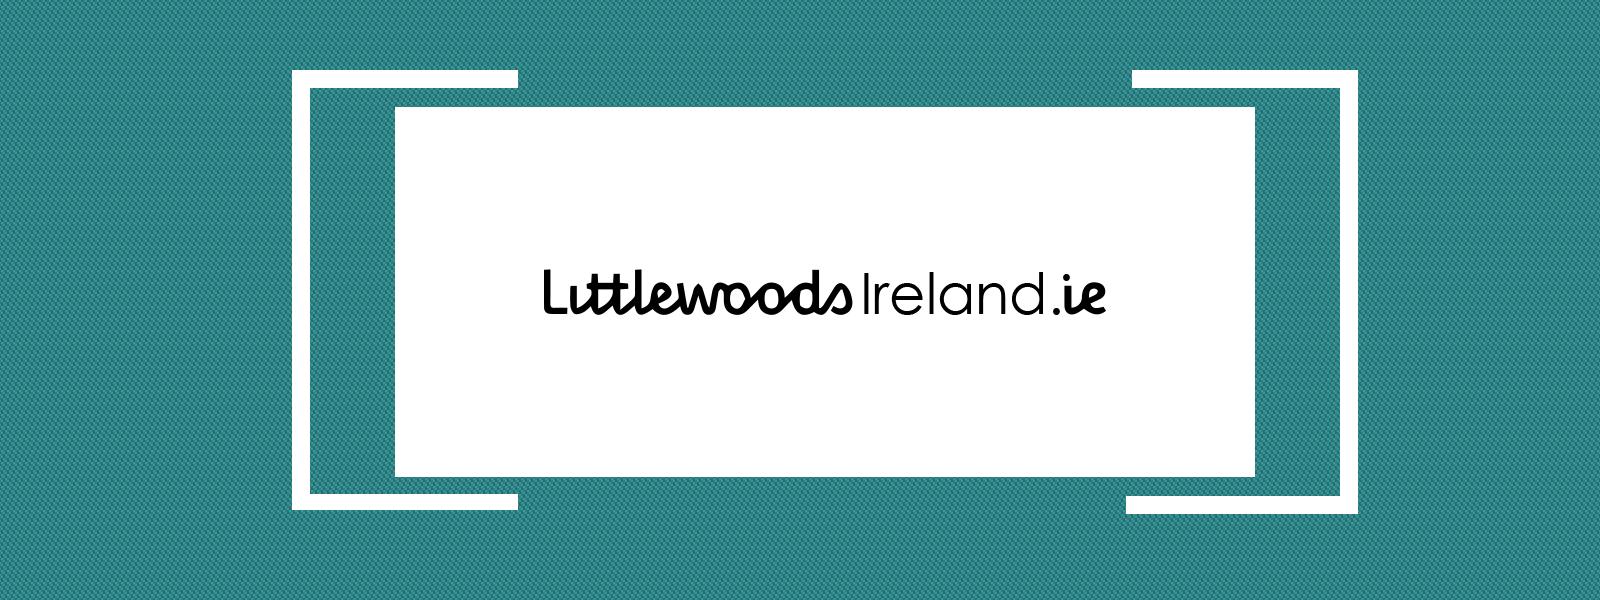 littlewoodsireland